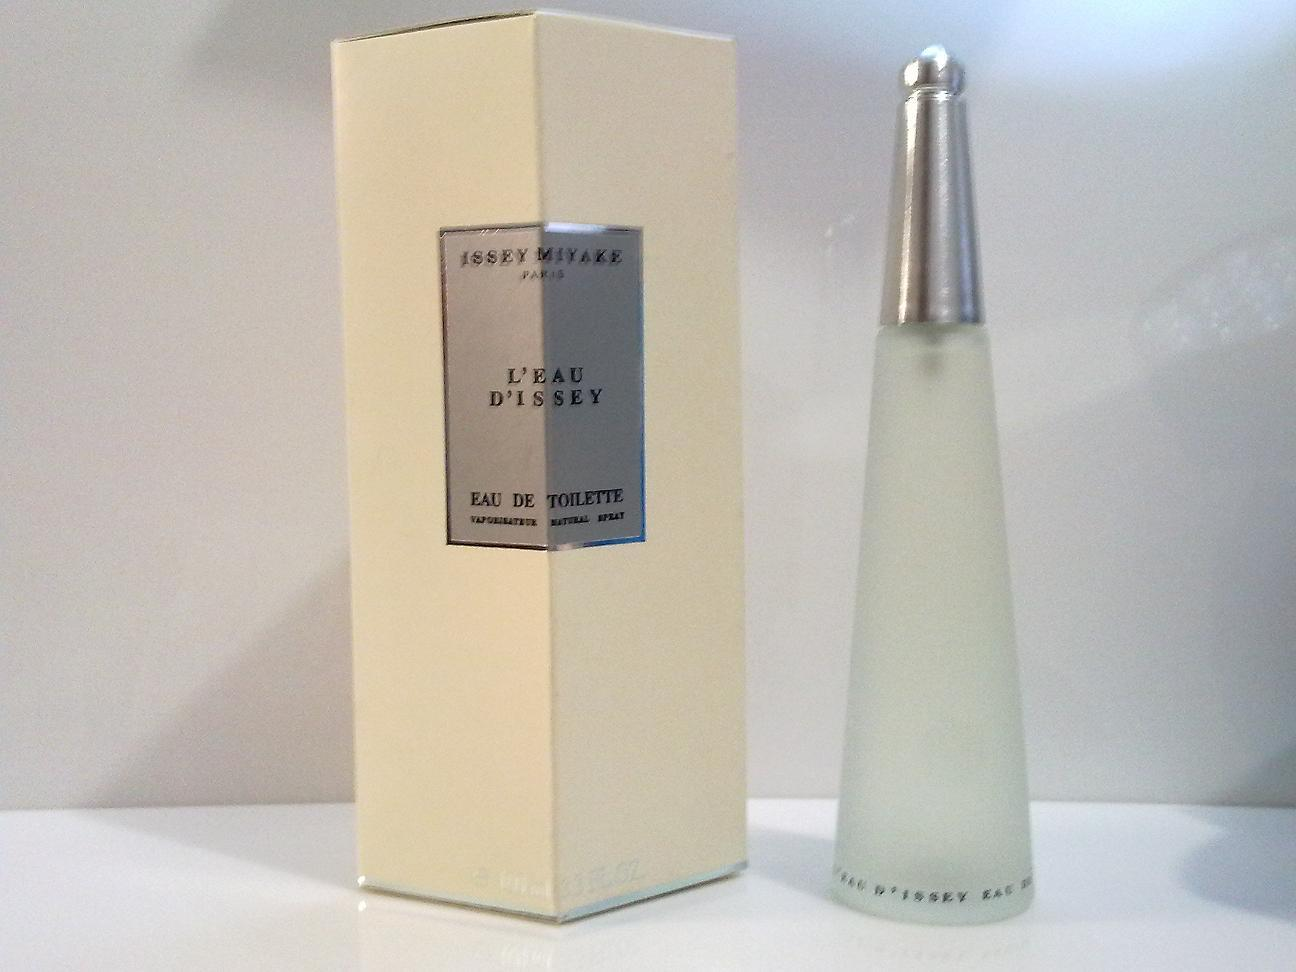 Parfum Wanita Daftar Harga November 2018 Senswell Eau De Cologne Midnight Fantasy 250 Ml Issey Miyake L D 100 Original From Singapore